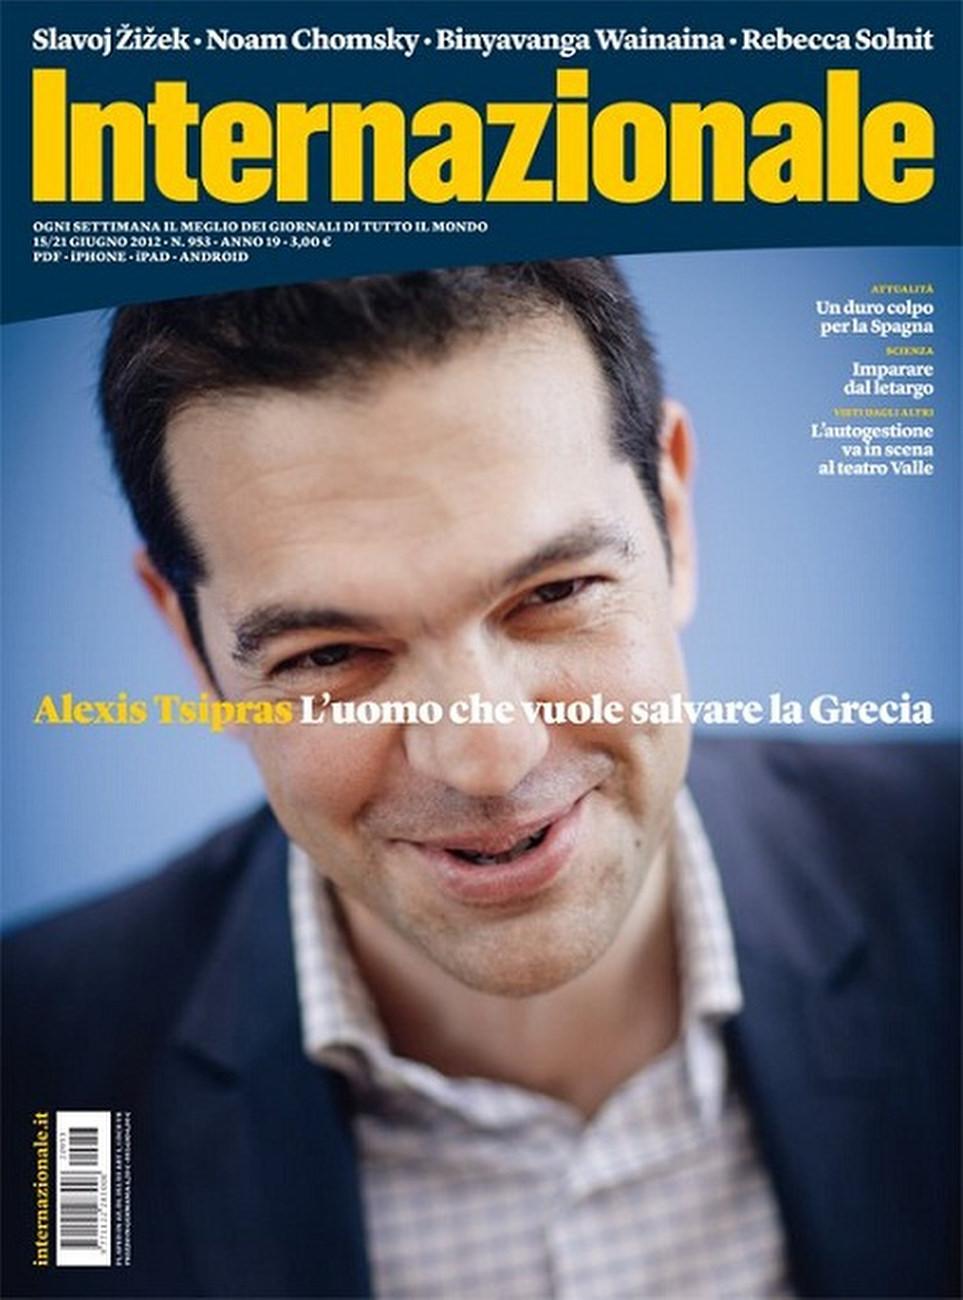 Internationale Magazine, Italy, Jul 02 2012 Alexis Tsipras